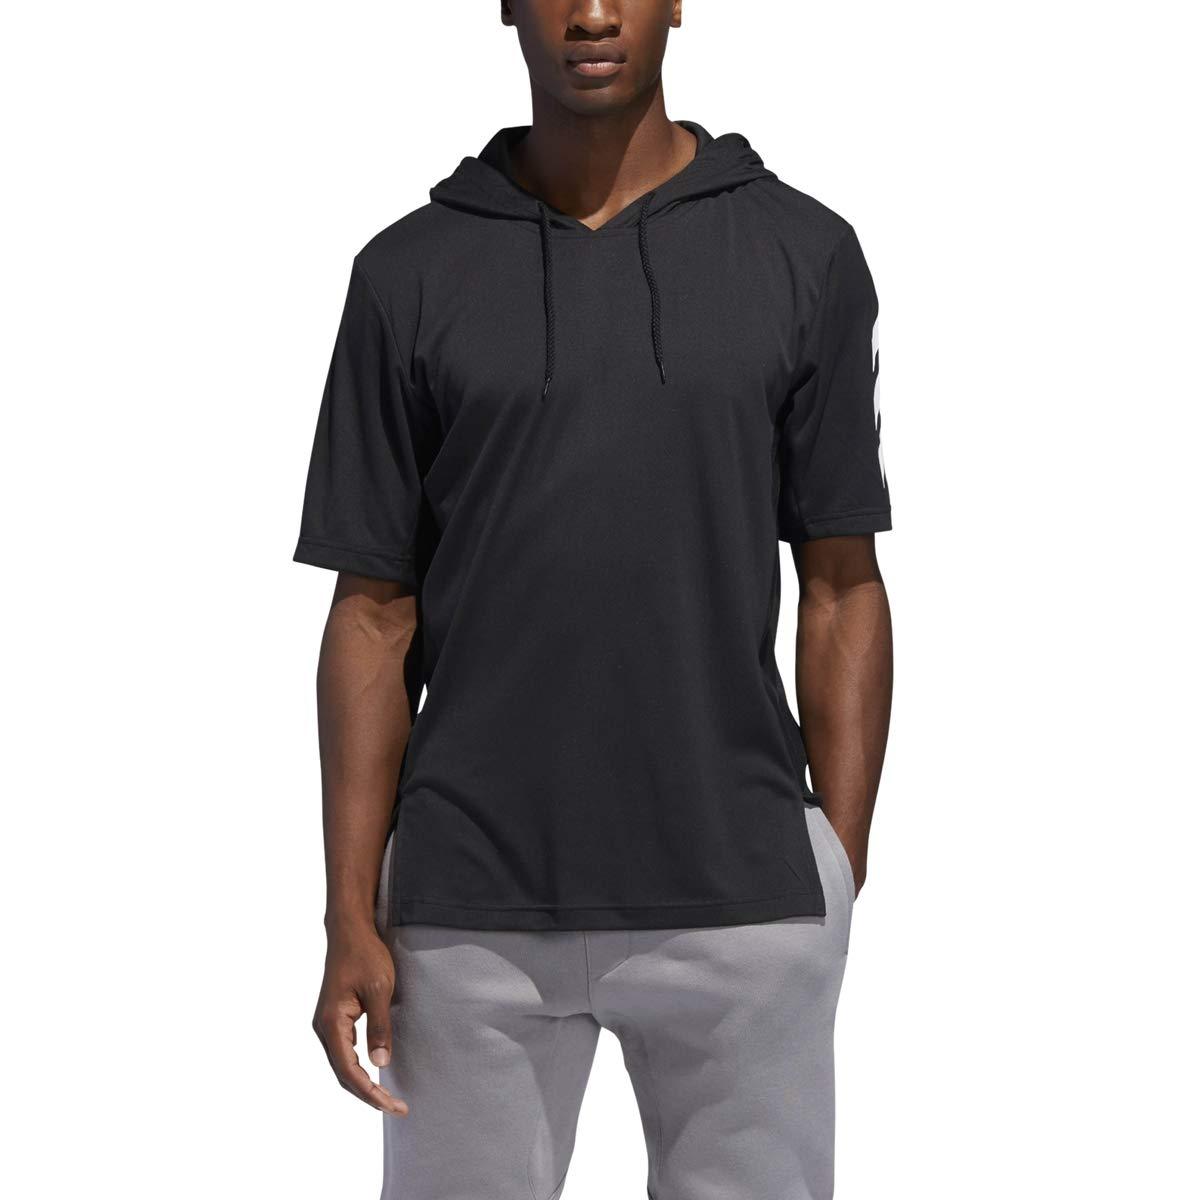 adidas SPT Hoodie - Men's Basketball 4XL Black by adidas